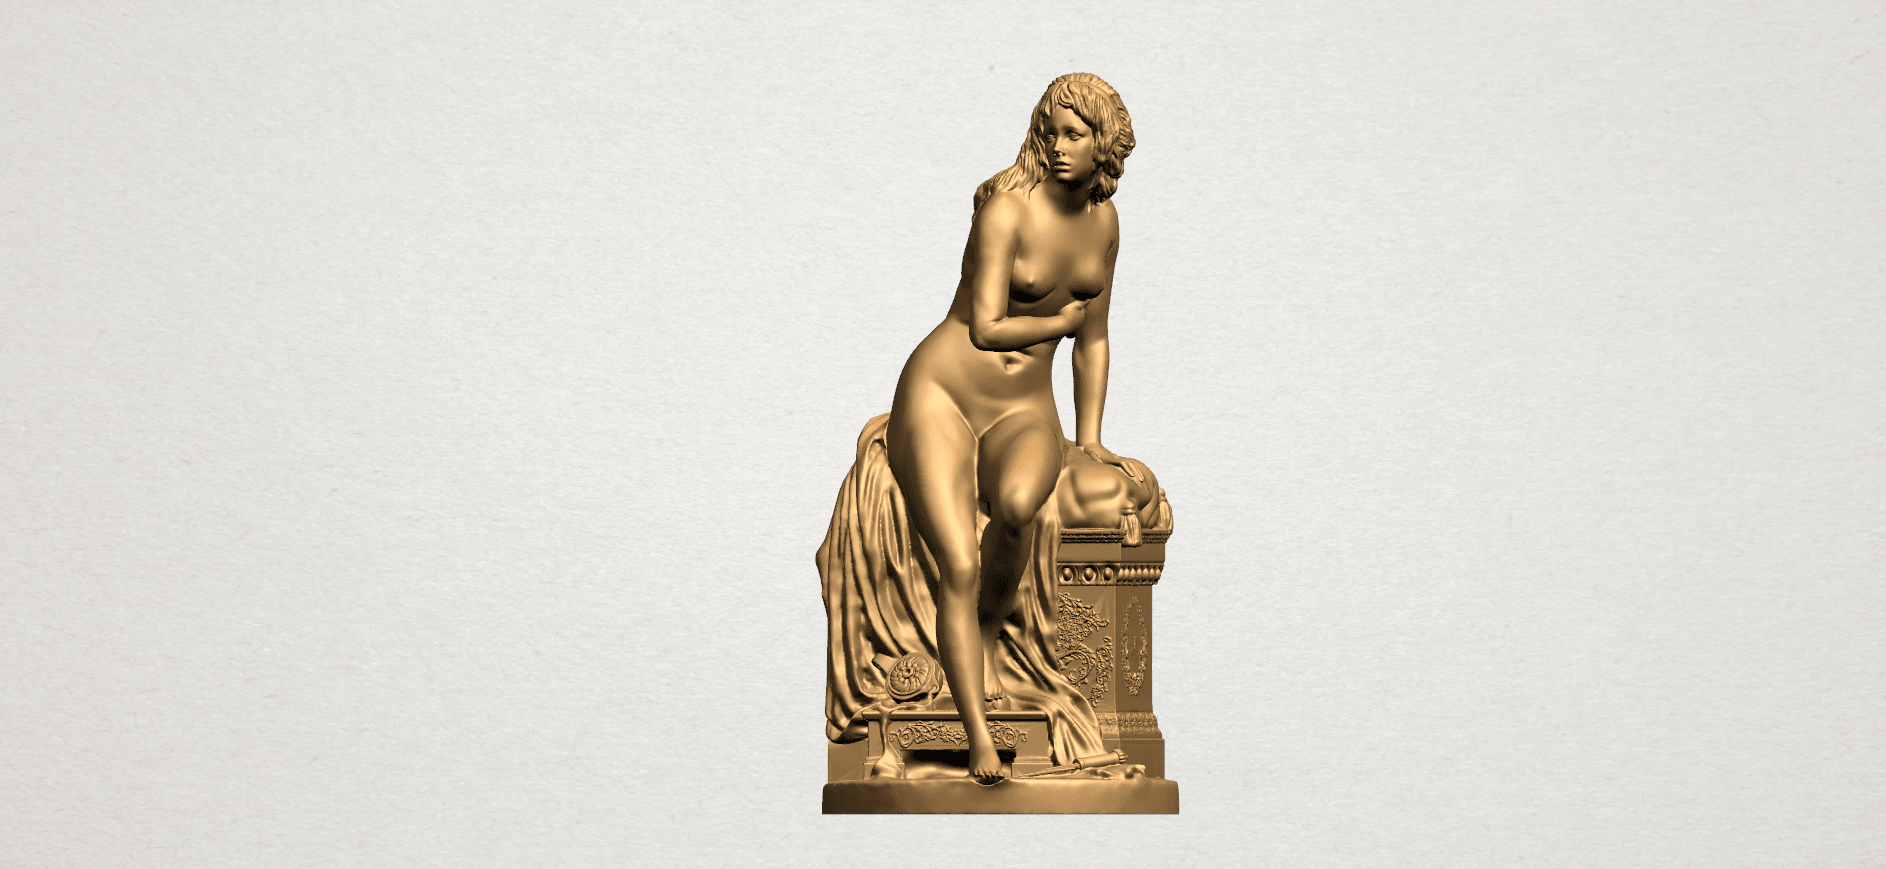 Naked Girl (i) B01.png Download free STL file Naked Girl 01 • 3D printing model, GeorgesNikkei